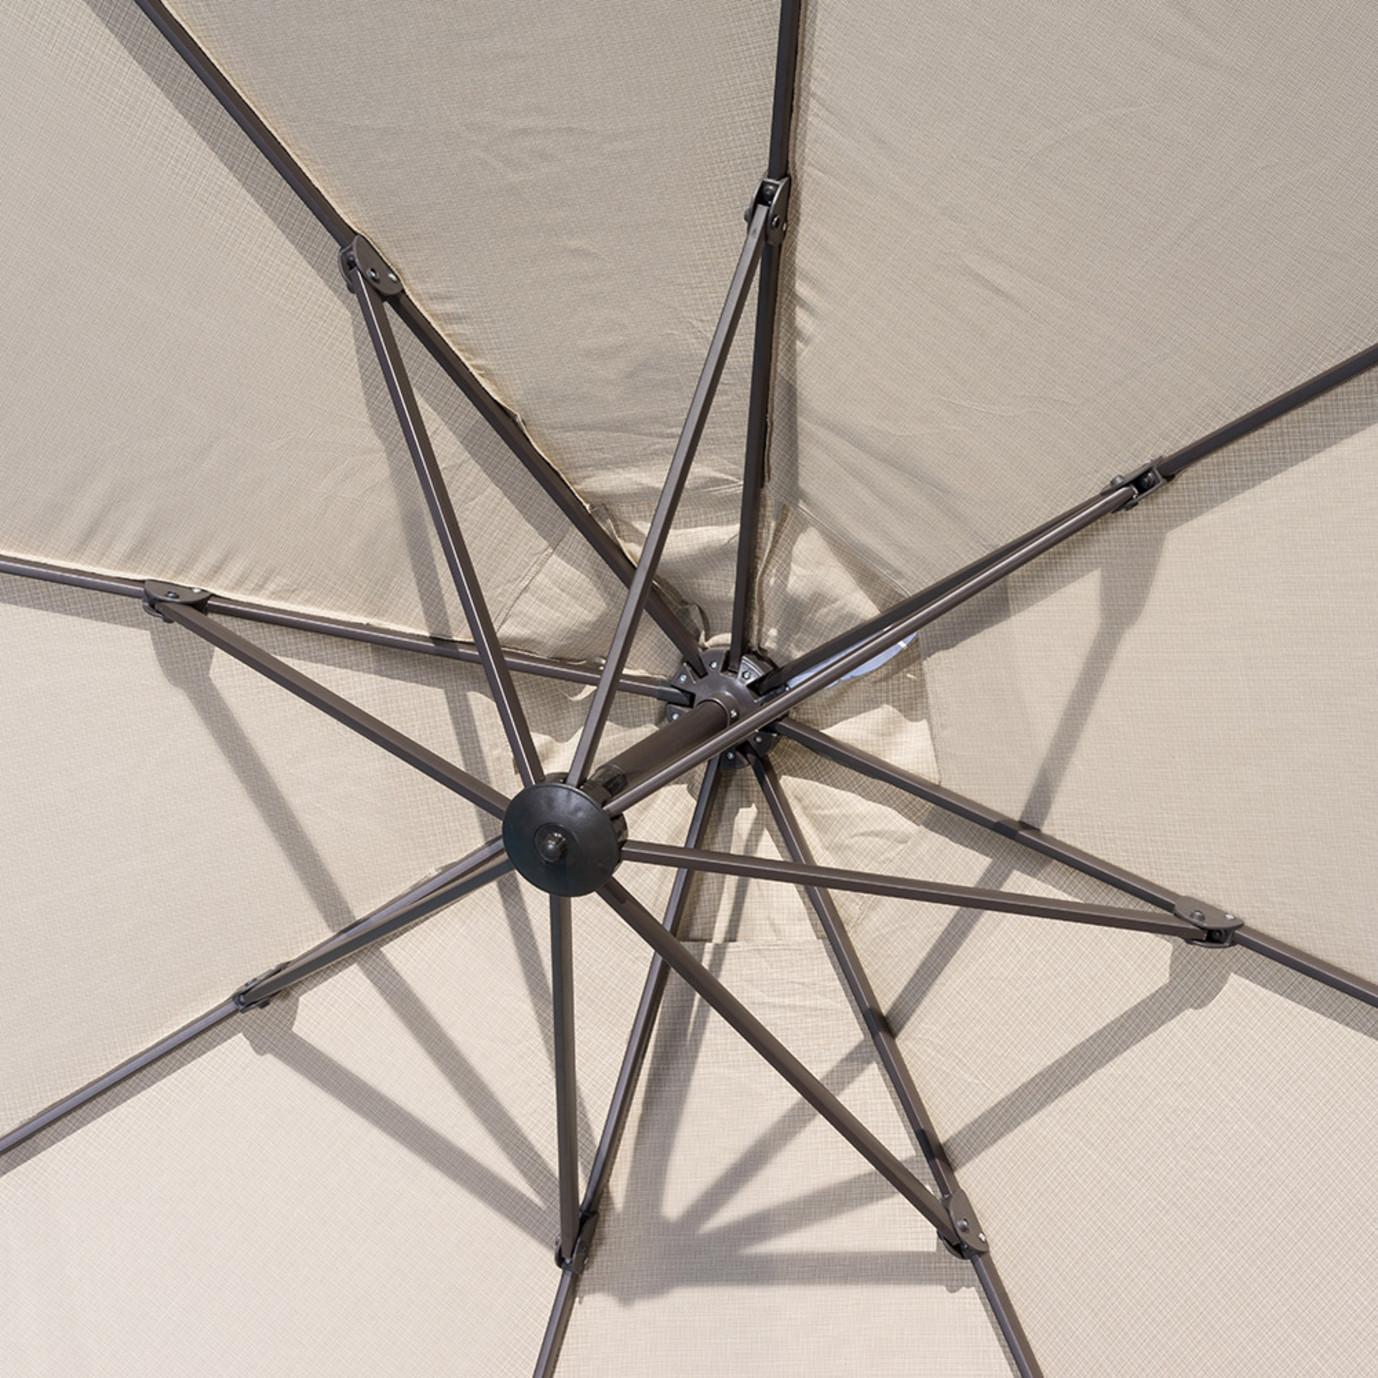 Modular Outdoor 10' Round Umbrella - Slate Gray